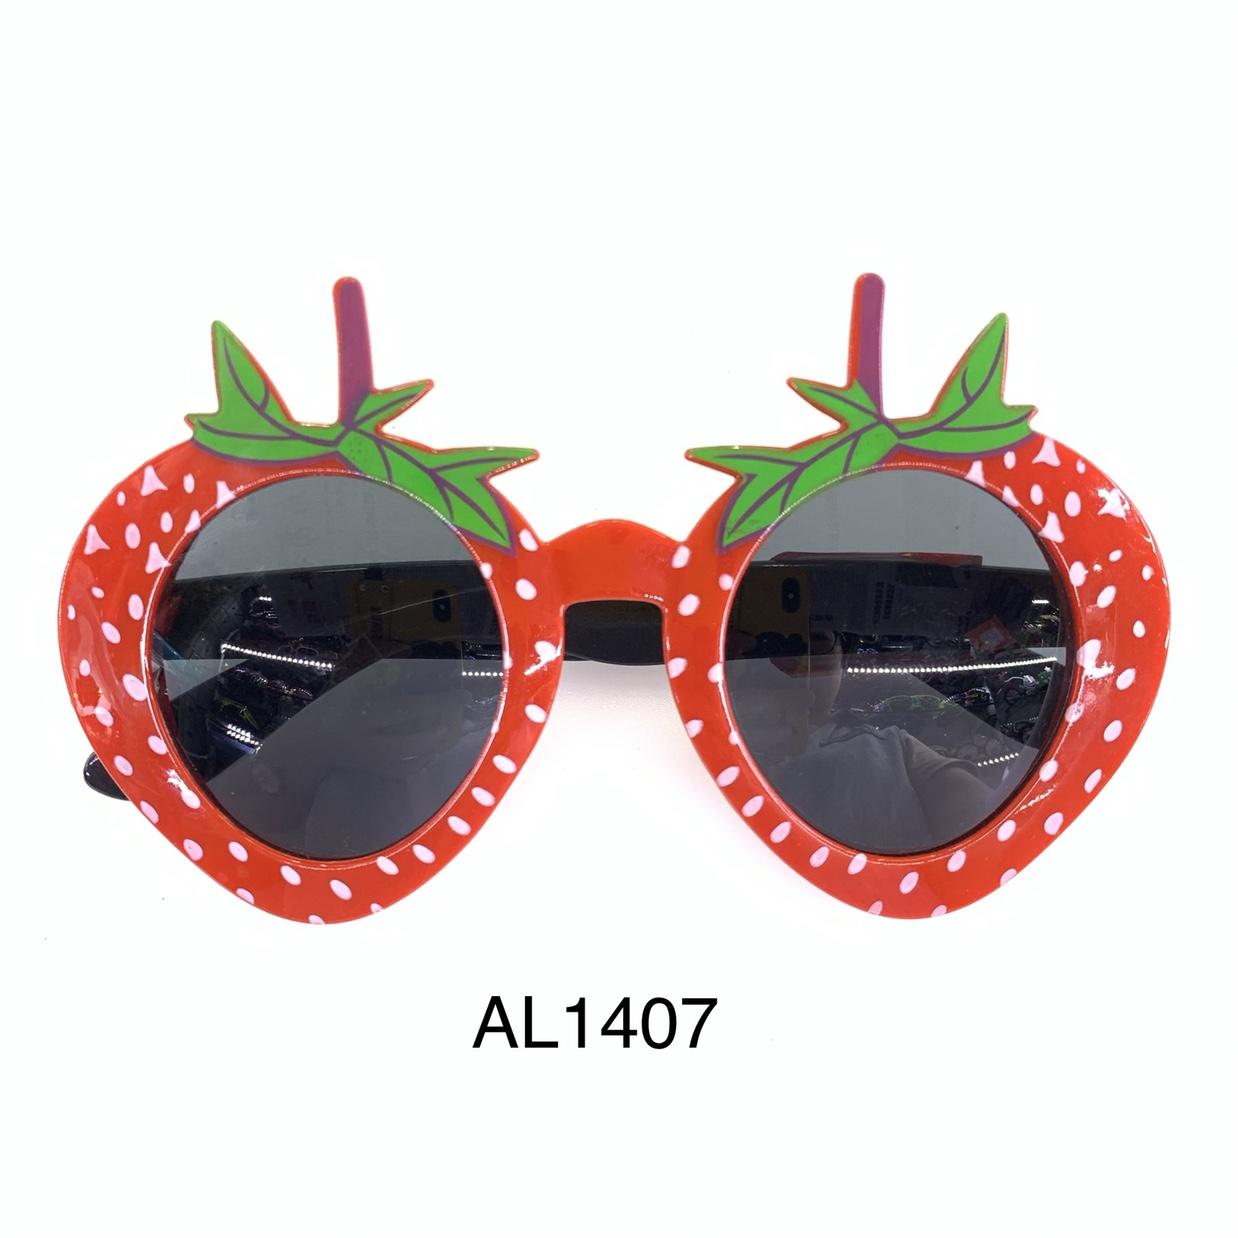 AL1407 派对装饰眼镜,草莓形状眼镜